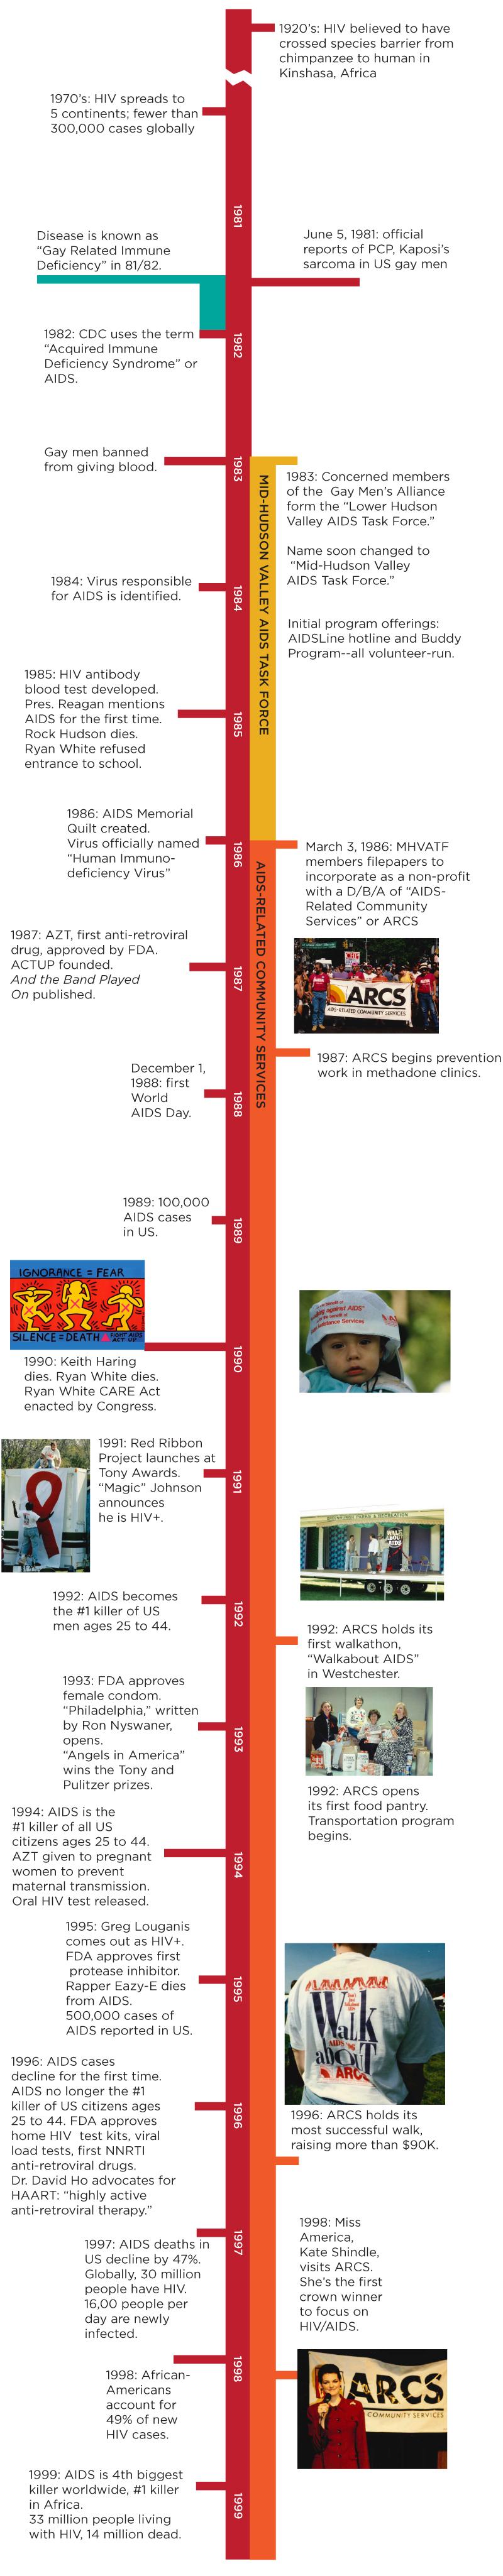 HVCS history, part 1